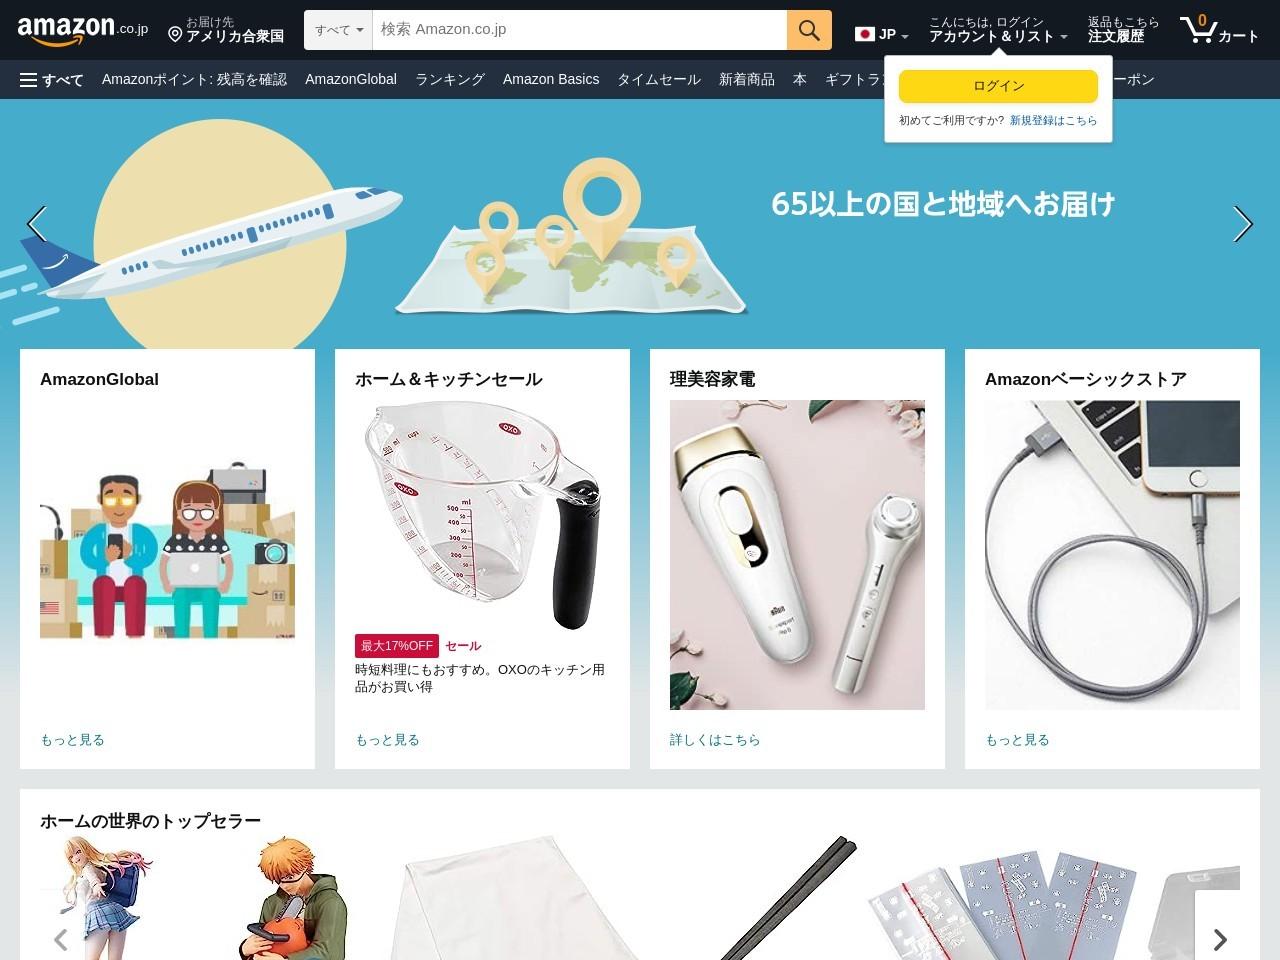 Amazon.co.jp ヘルプ: 梱包要件